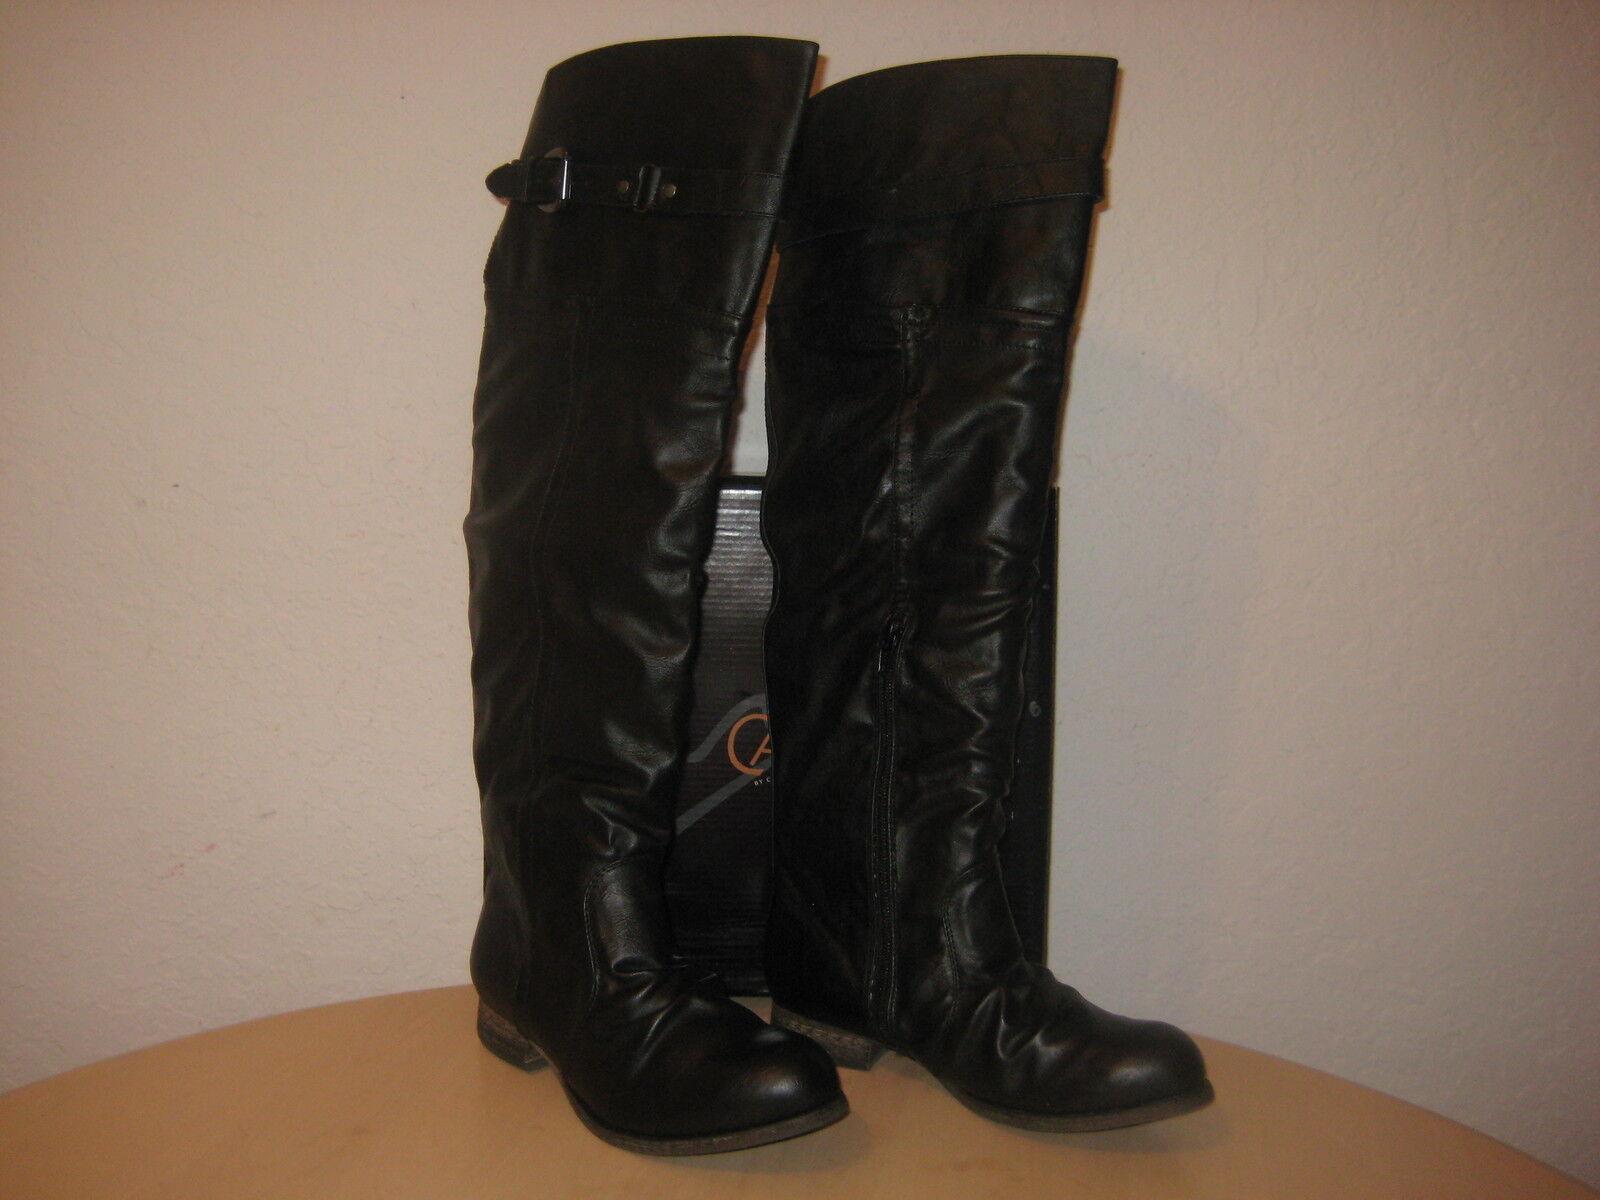 Carlos By Carlos Santana New Womens Traverse Black Vintage Boots 7.5 M Shoes NWB